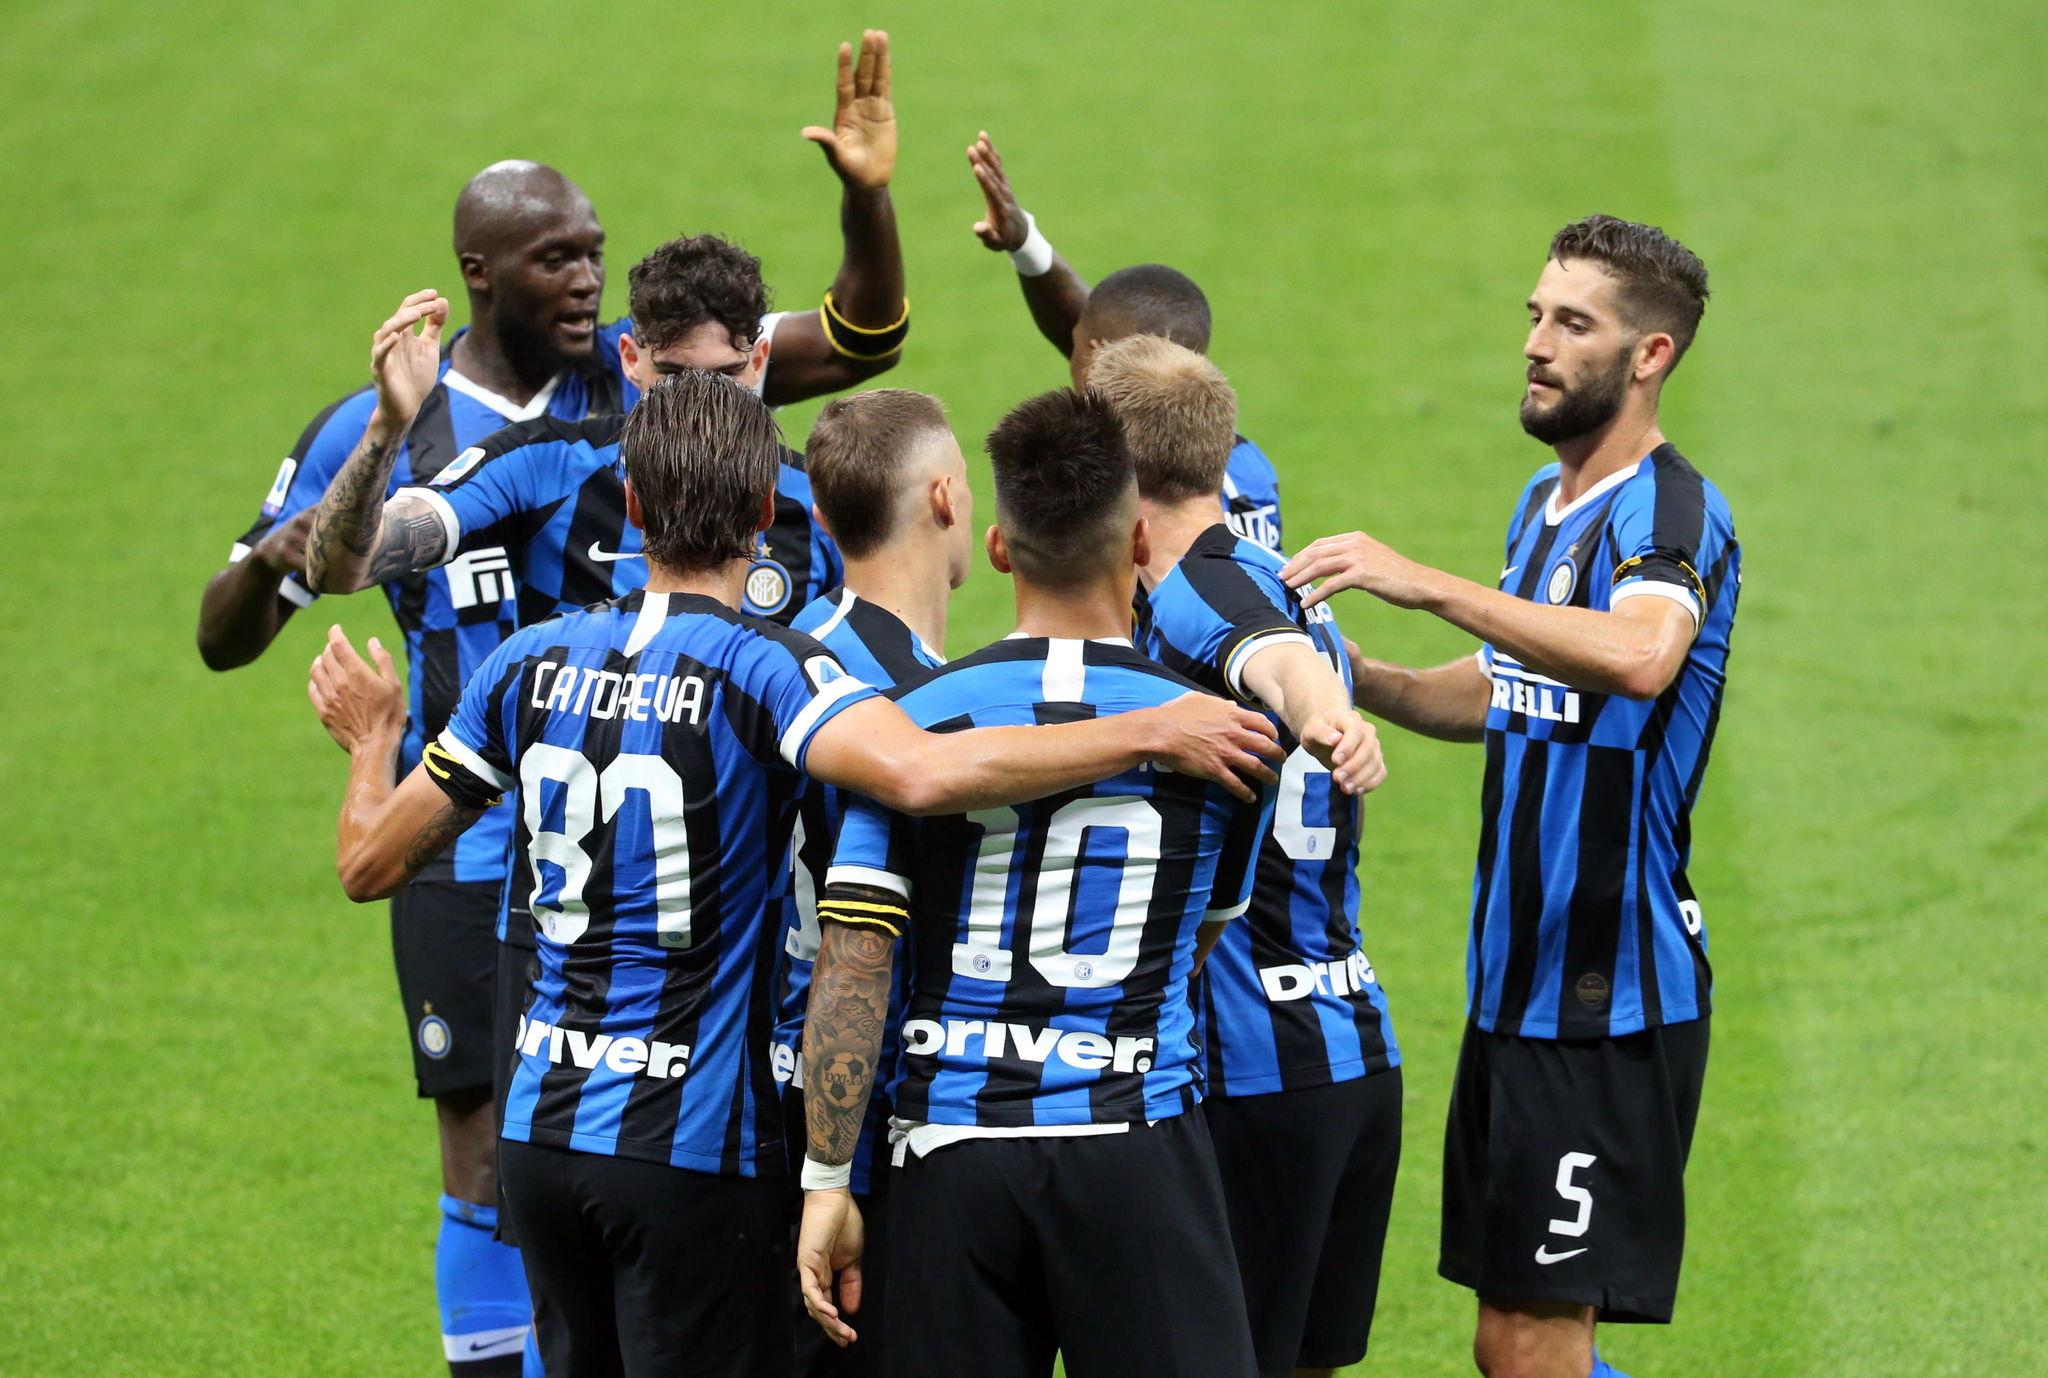 Milan (Italy), 21/06/2020.- Inter Milans lt;HIT gt;Lautaro lt;/HIT gt; lt;HIT gt;Martinez lt;/HIT gt; celebrates with his teammates after scoring the 2-0 goal during the Italian serie A soccer match FC Inter vs UC Sampdoria in Milan, Italy, 21 June 2020. (Italia) EFE/EPA/MATTEO BAZZI